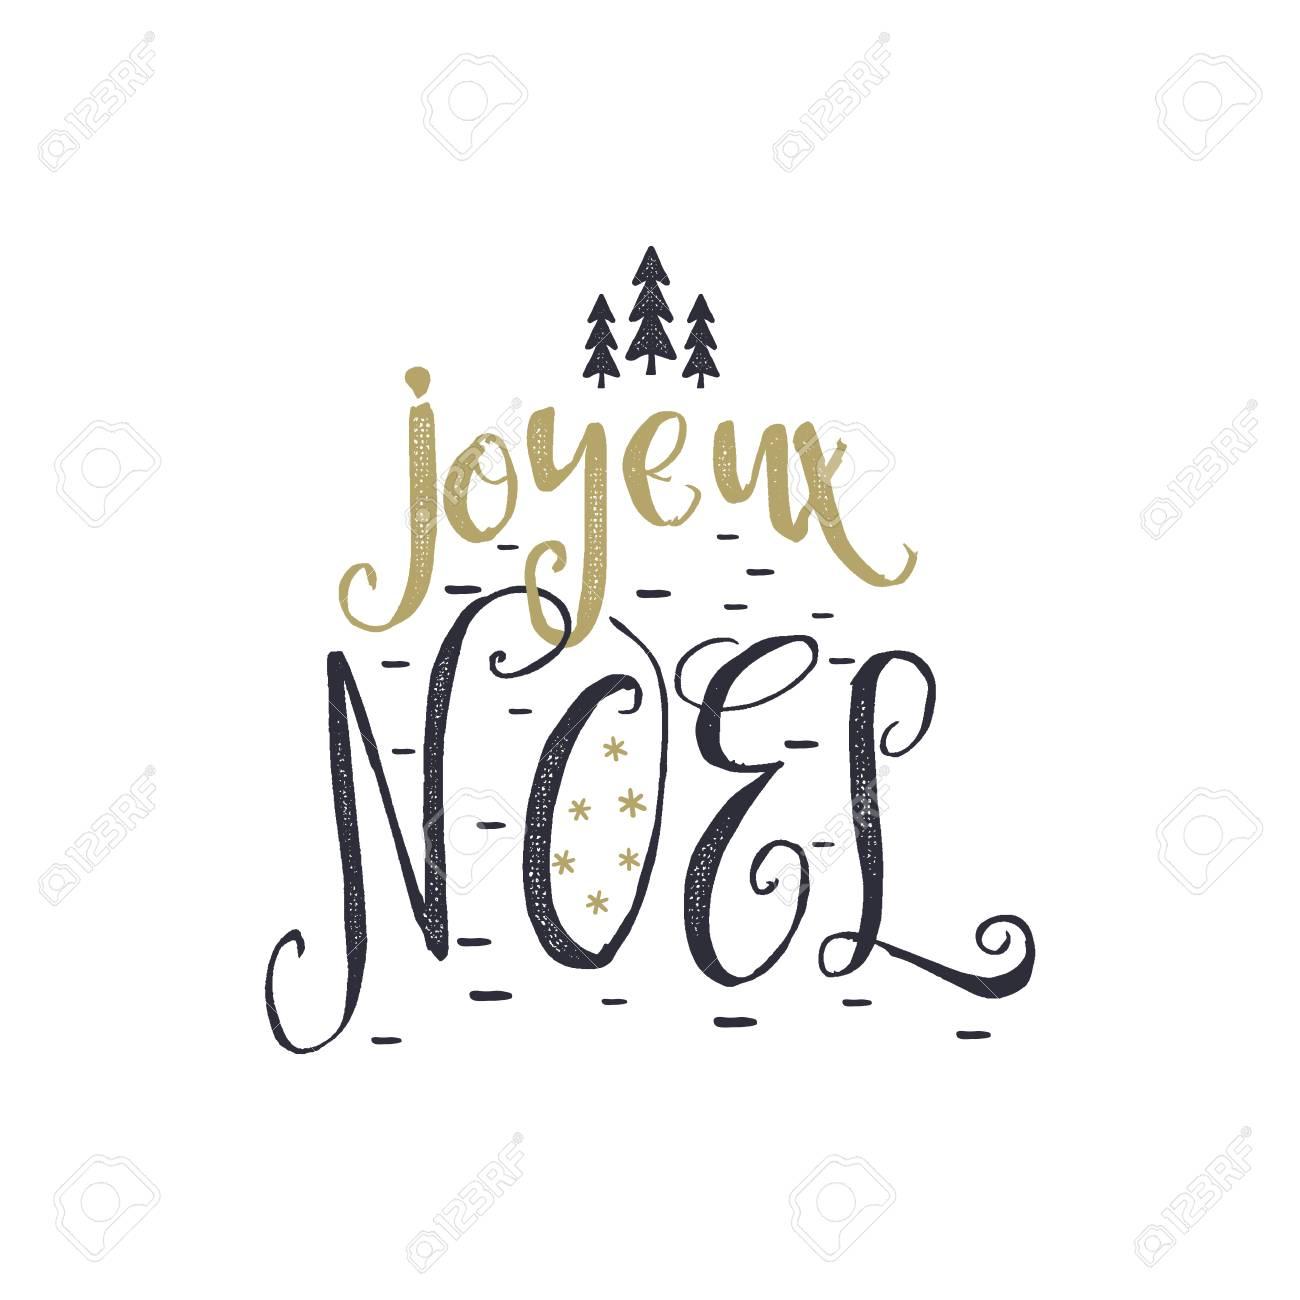 Joyeux Noel Clipart.Christmas In French Greeting Joyeux Noel Typography Joyeux